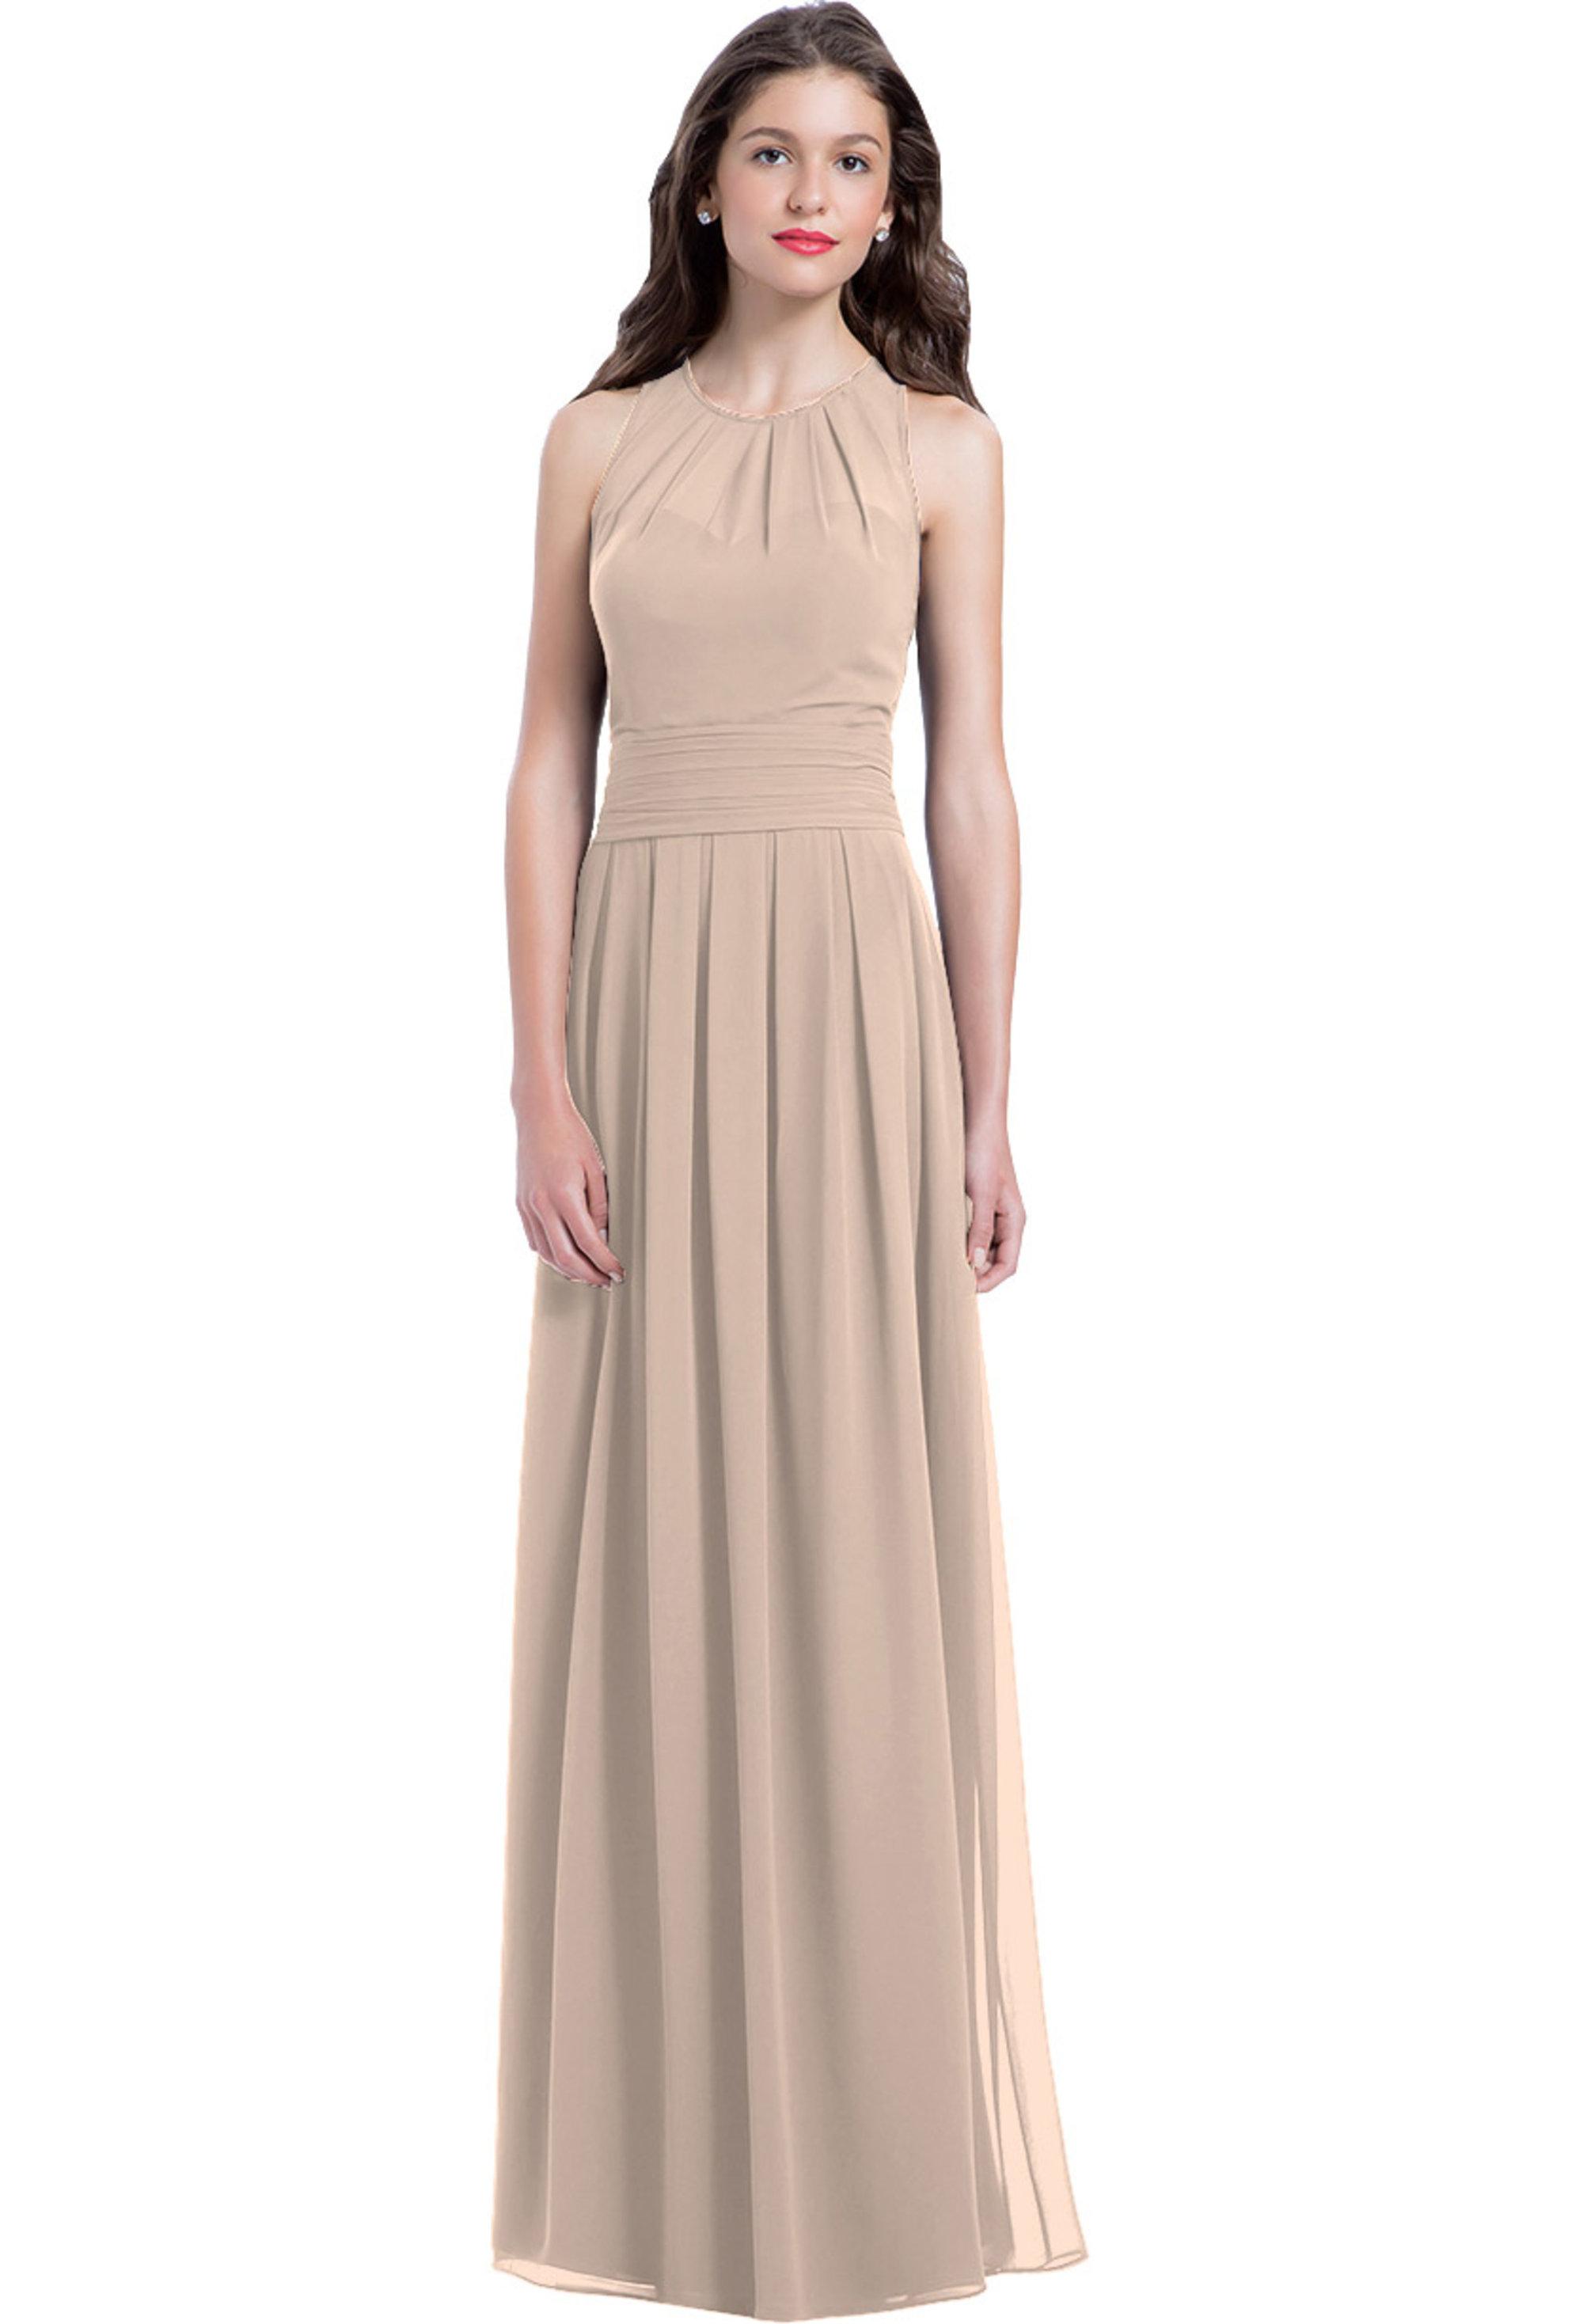 Bill Levkoff SHELL PINK Chiffon Jewel A-line gown, $220.00 Front